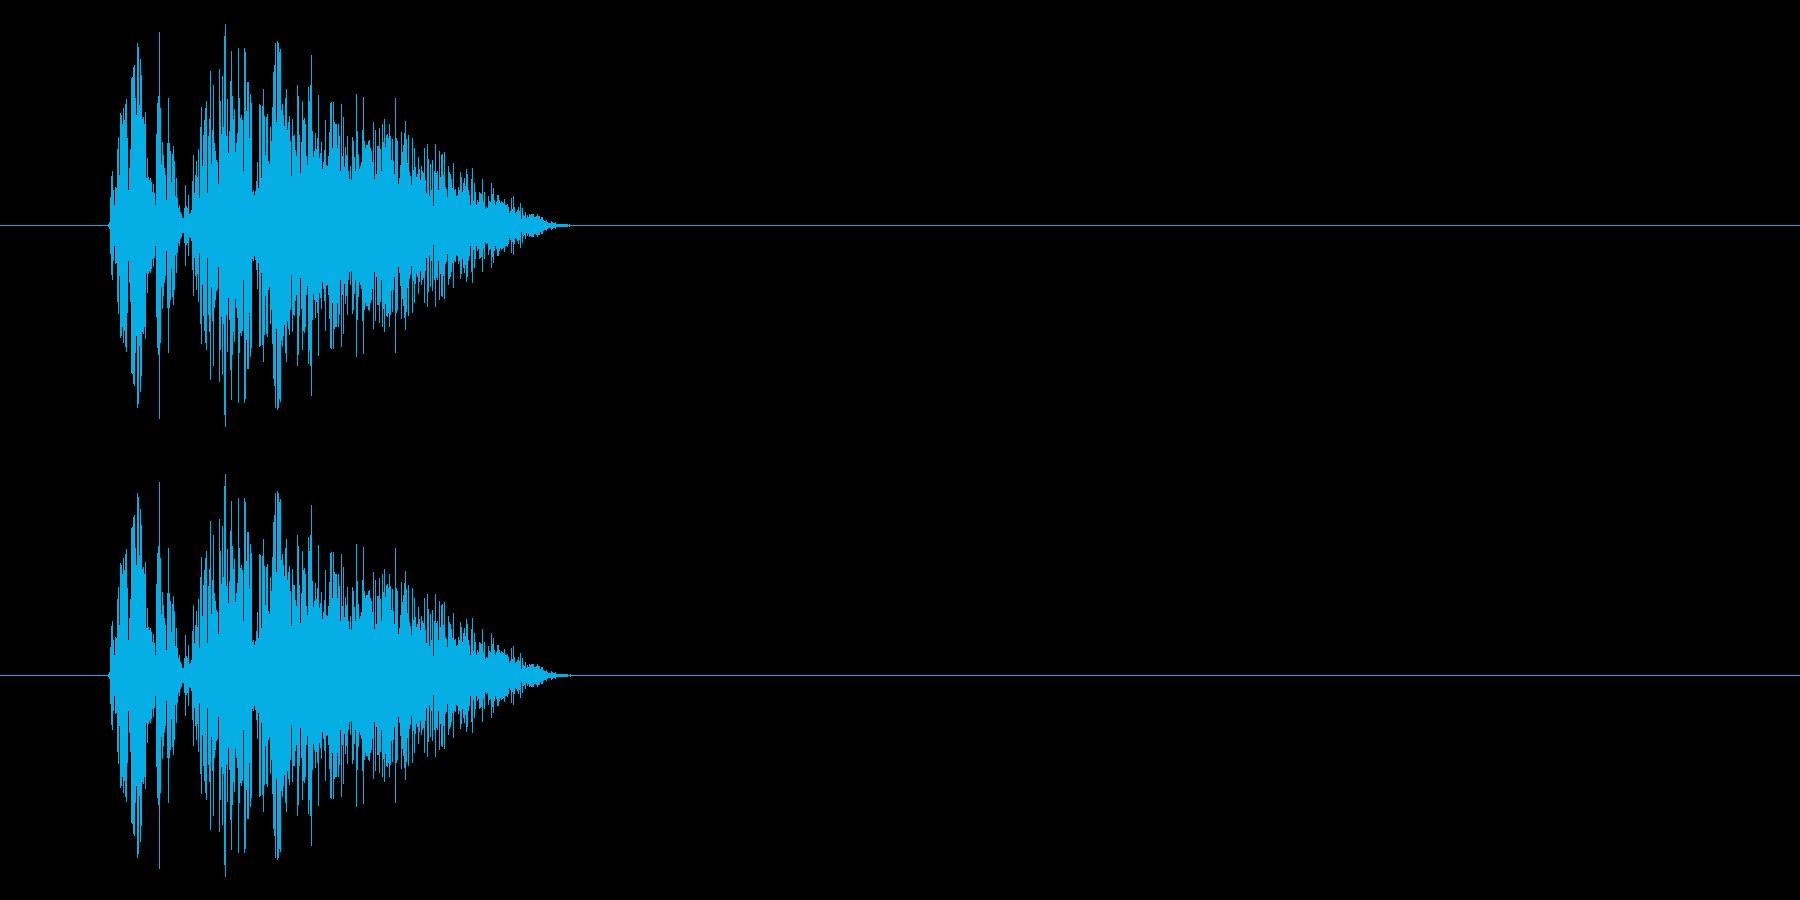 GEN-格闘01-03(ヒット)の再生済みの波形